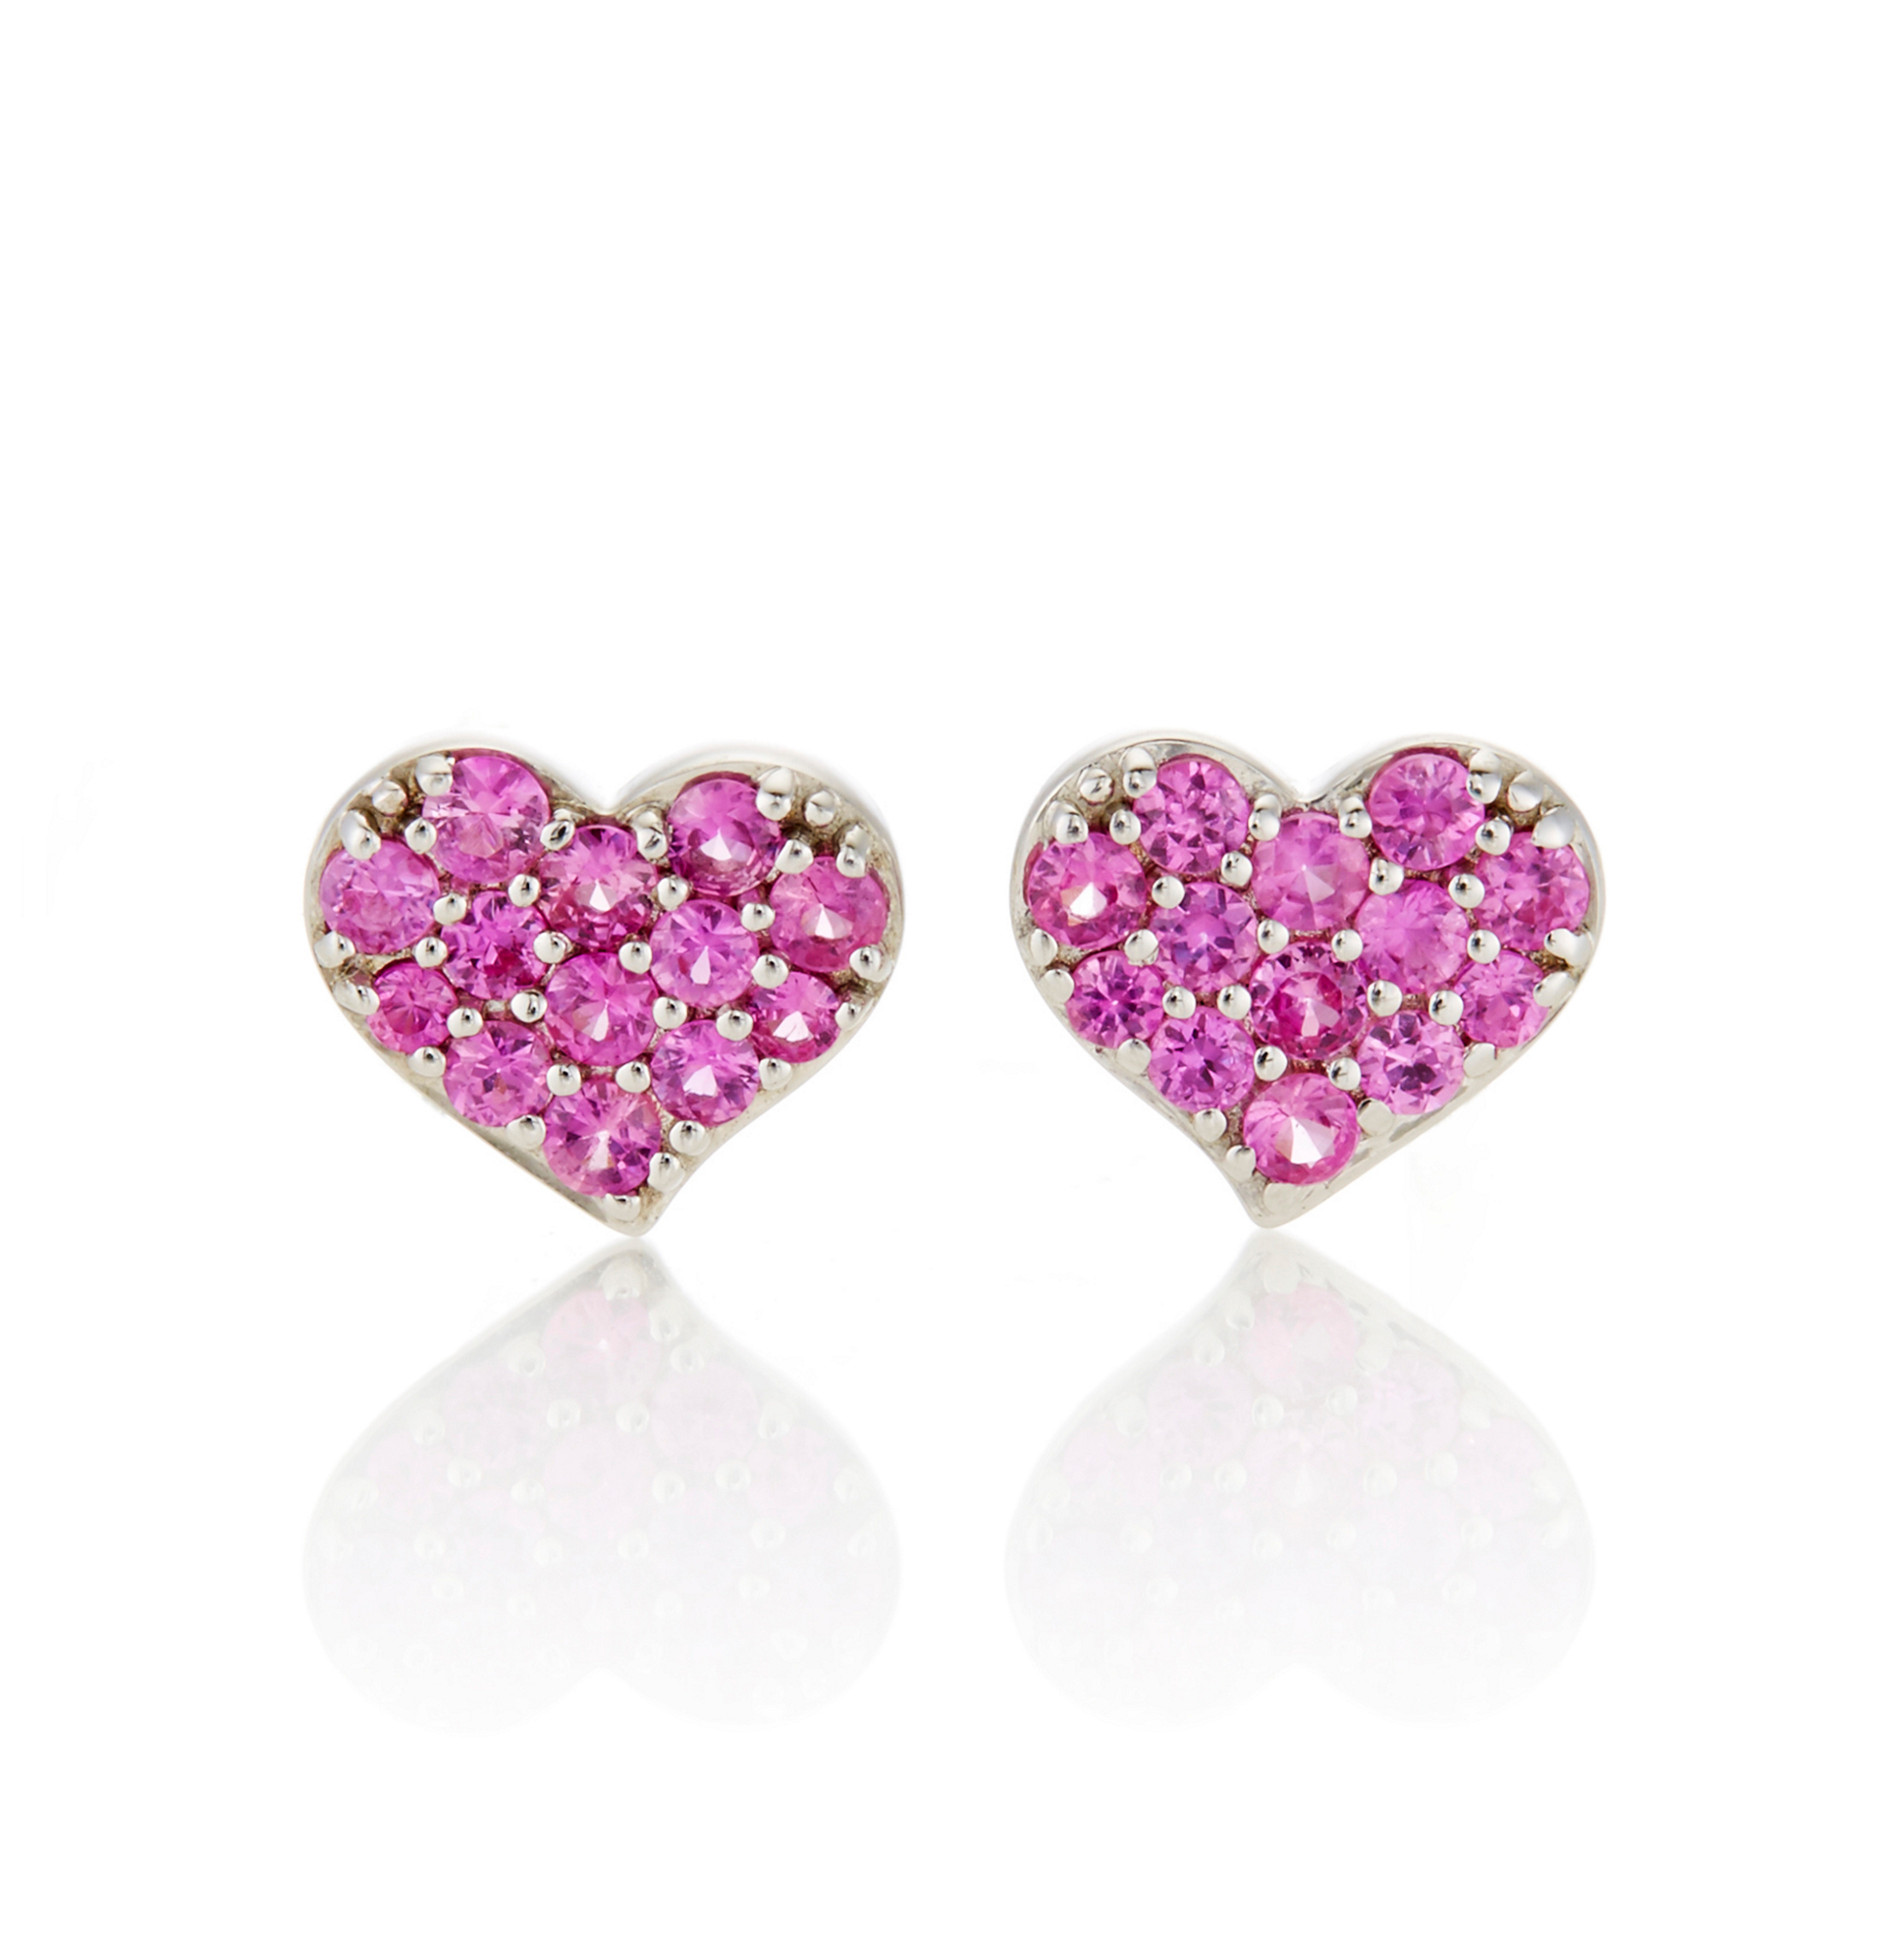 Gump\'s Pink Sapphire Heart Stud Earrings | Gump\'s